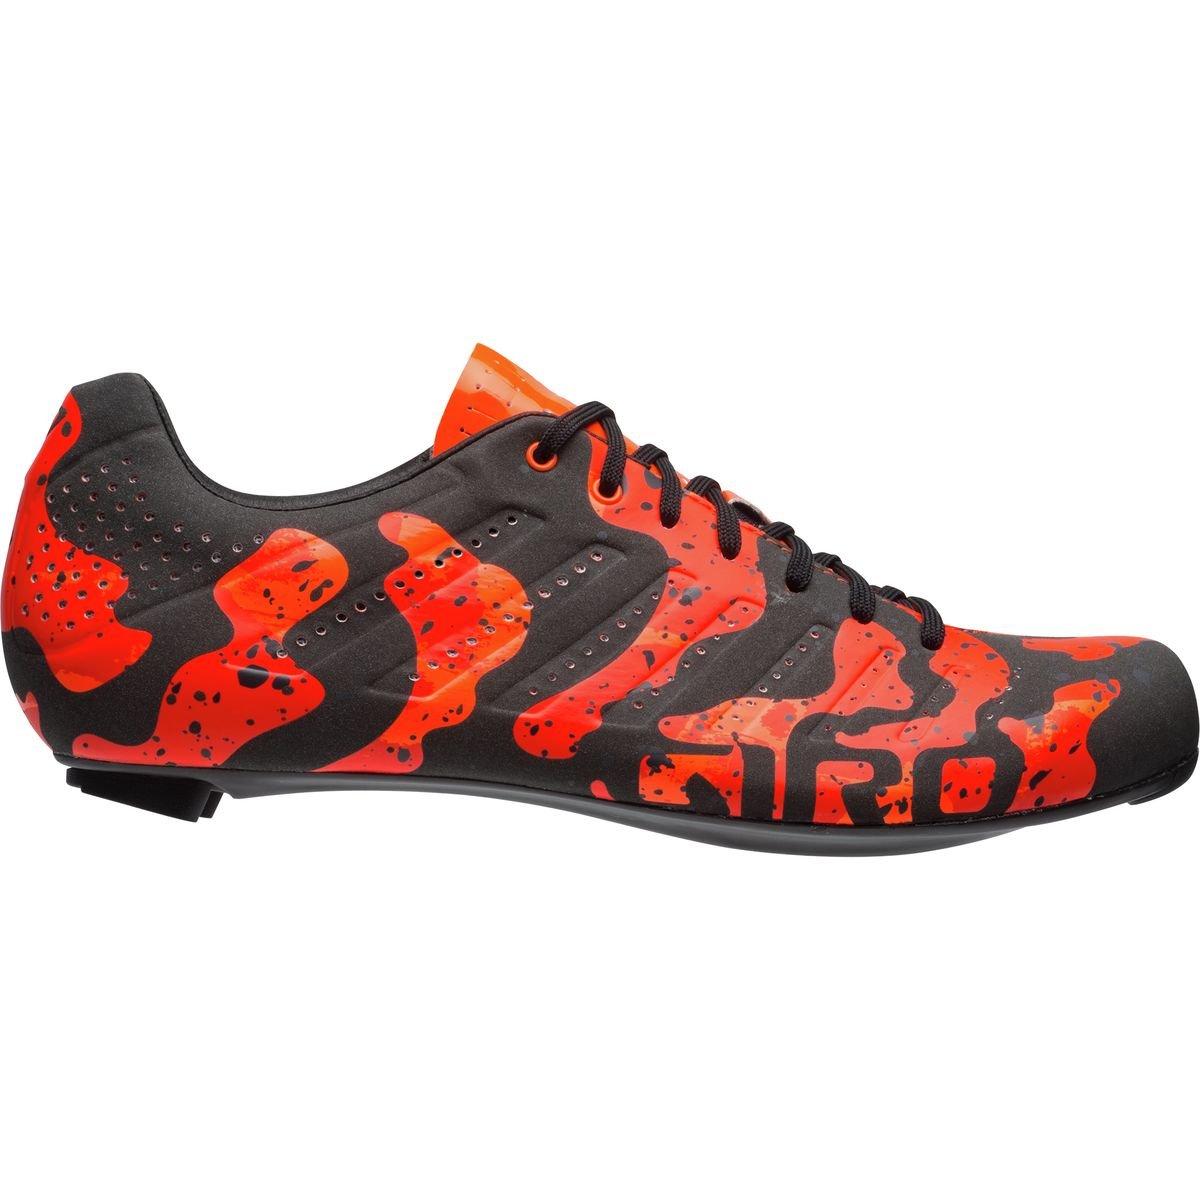 Giro Empire SLX 限定版 シューズ メンズ B073RRLTRQ 42.5|Orange Lava Lamp Orange Lava Lamp 42.5